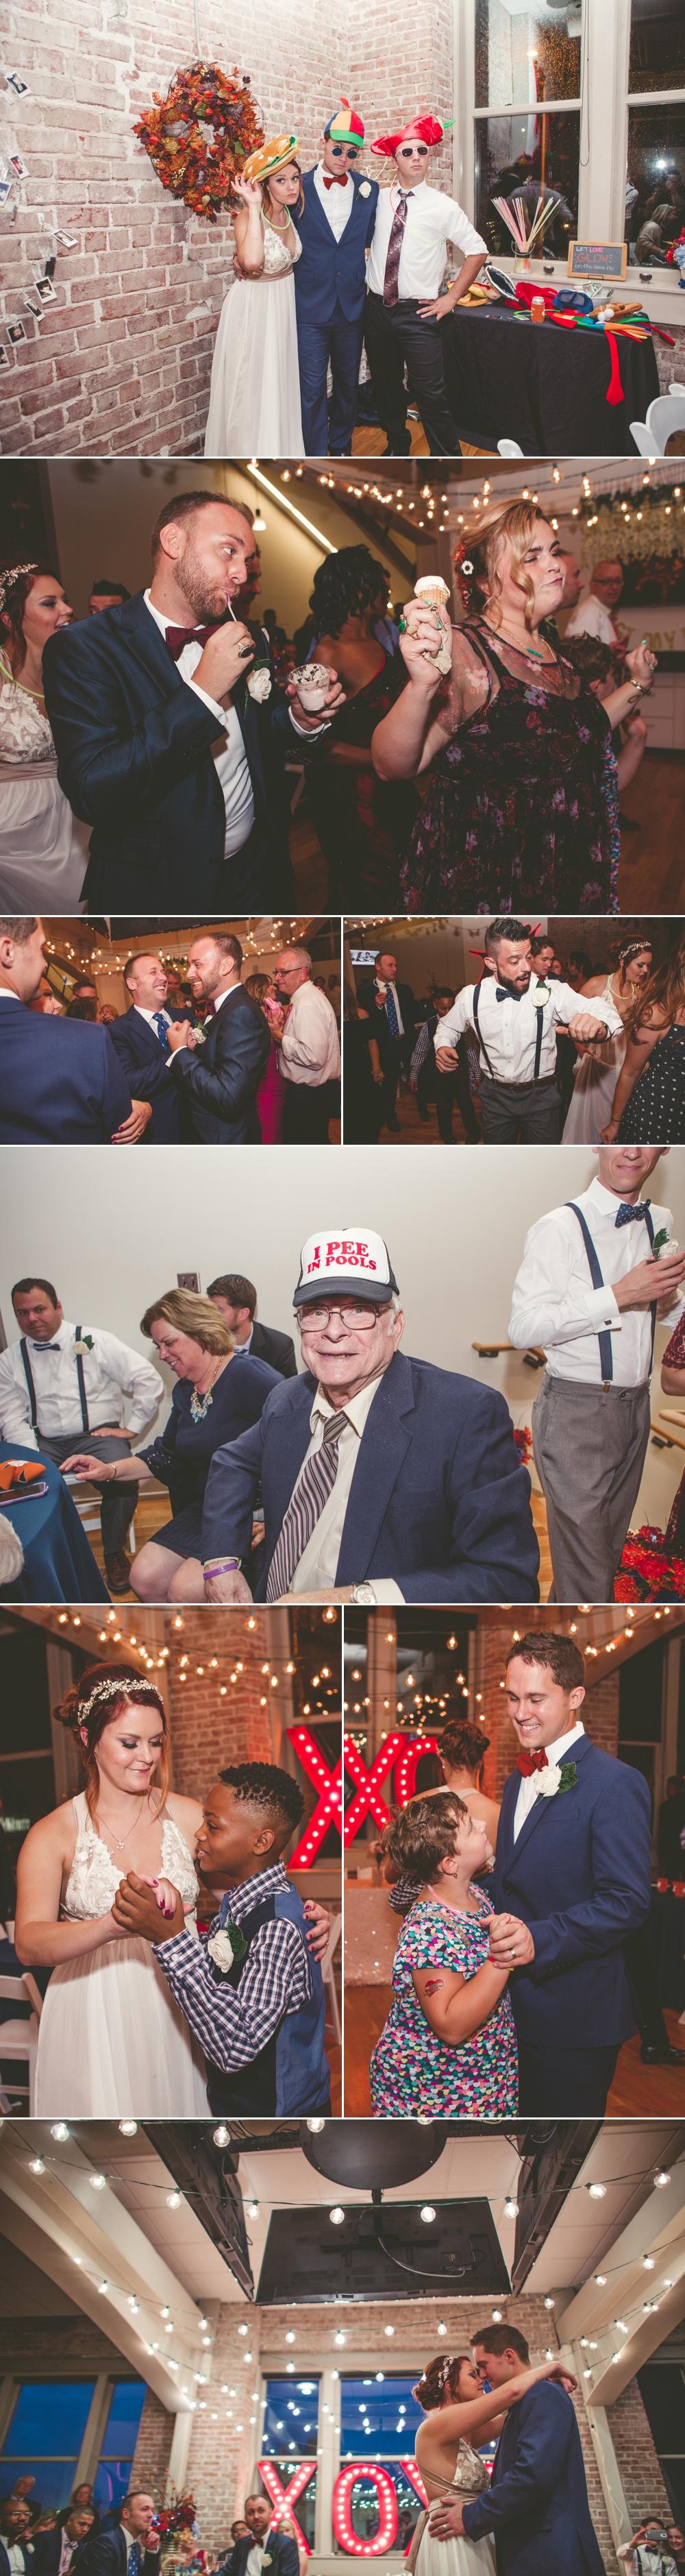 jason_domingues_photography_best_kansas_city_wedding_photographer_kc_weddings_big_brothers_big_sisters_0004.JPG